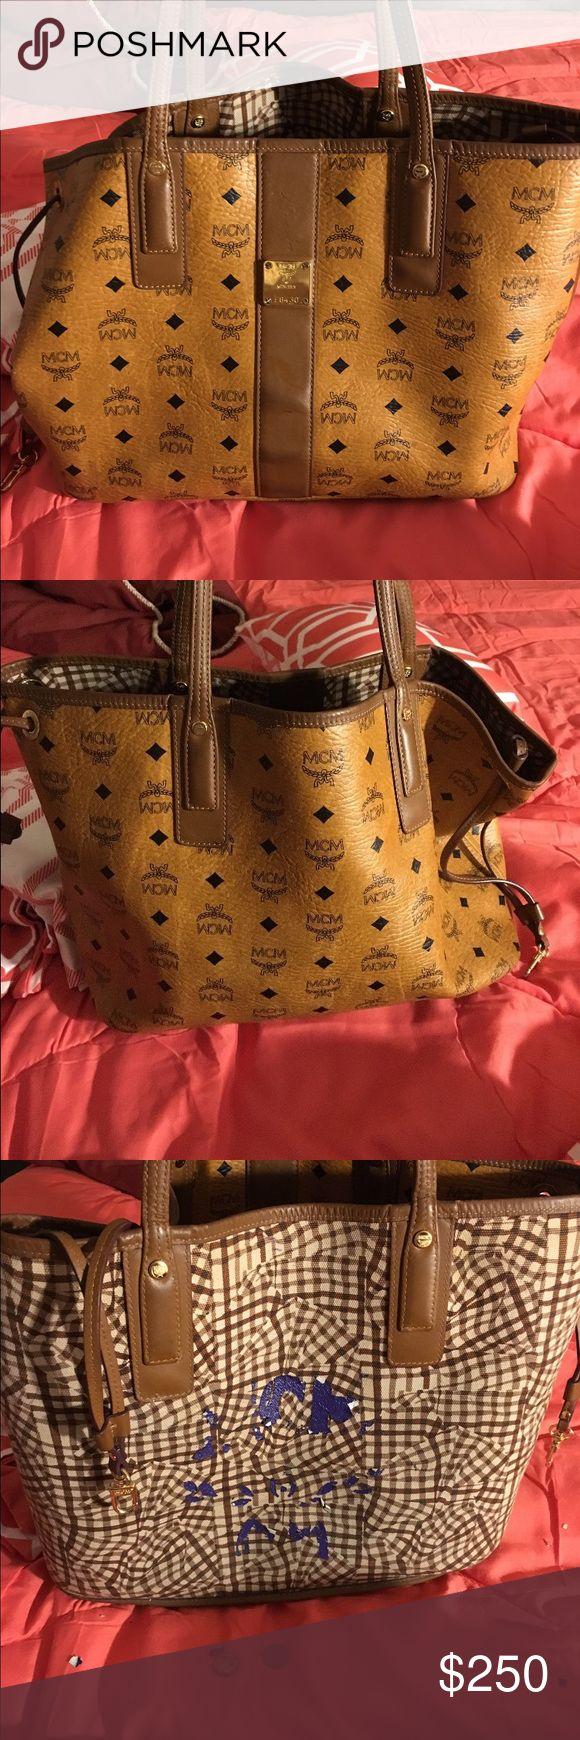 MCM USED BAG PRICE NEGOTIABLE MCM USED BAG PRICE NEGOTIABLE Bags Shoulder Bags